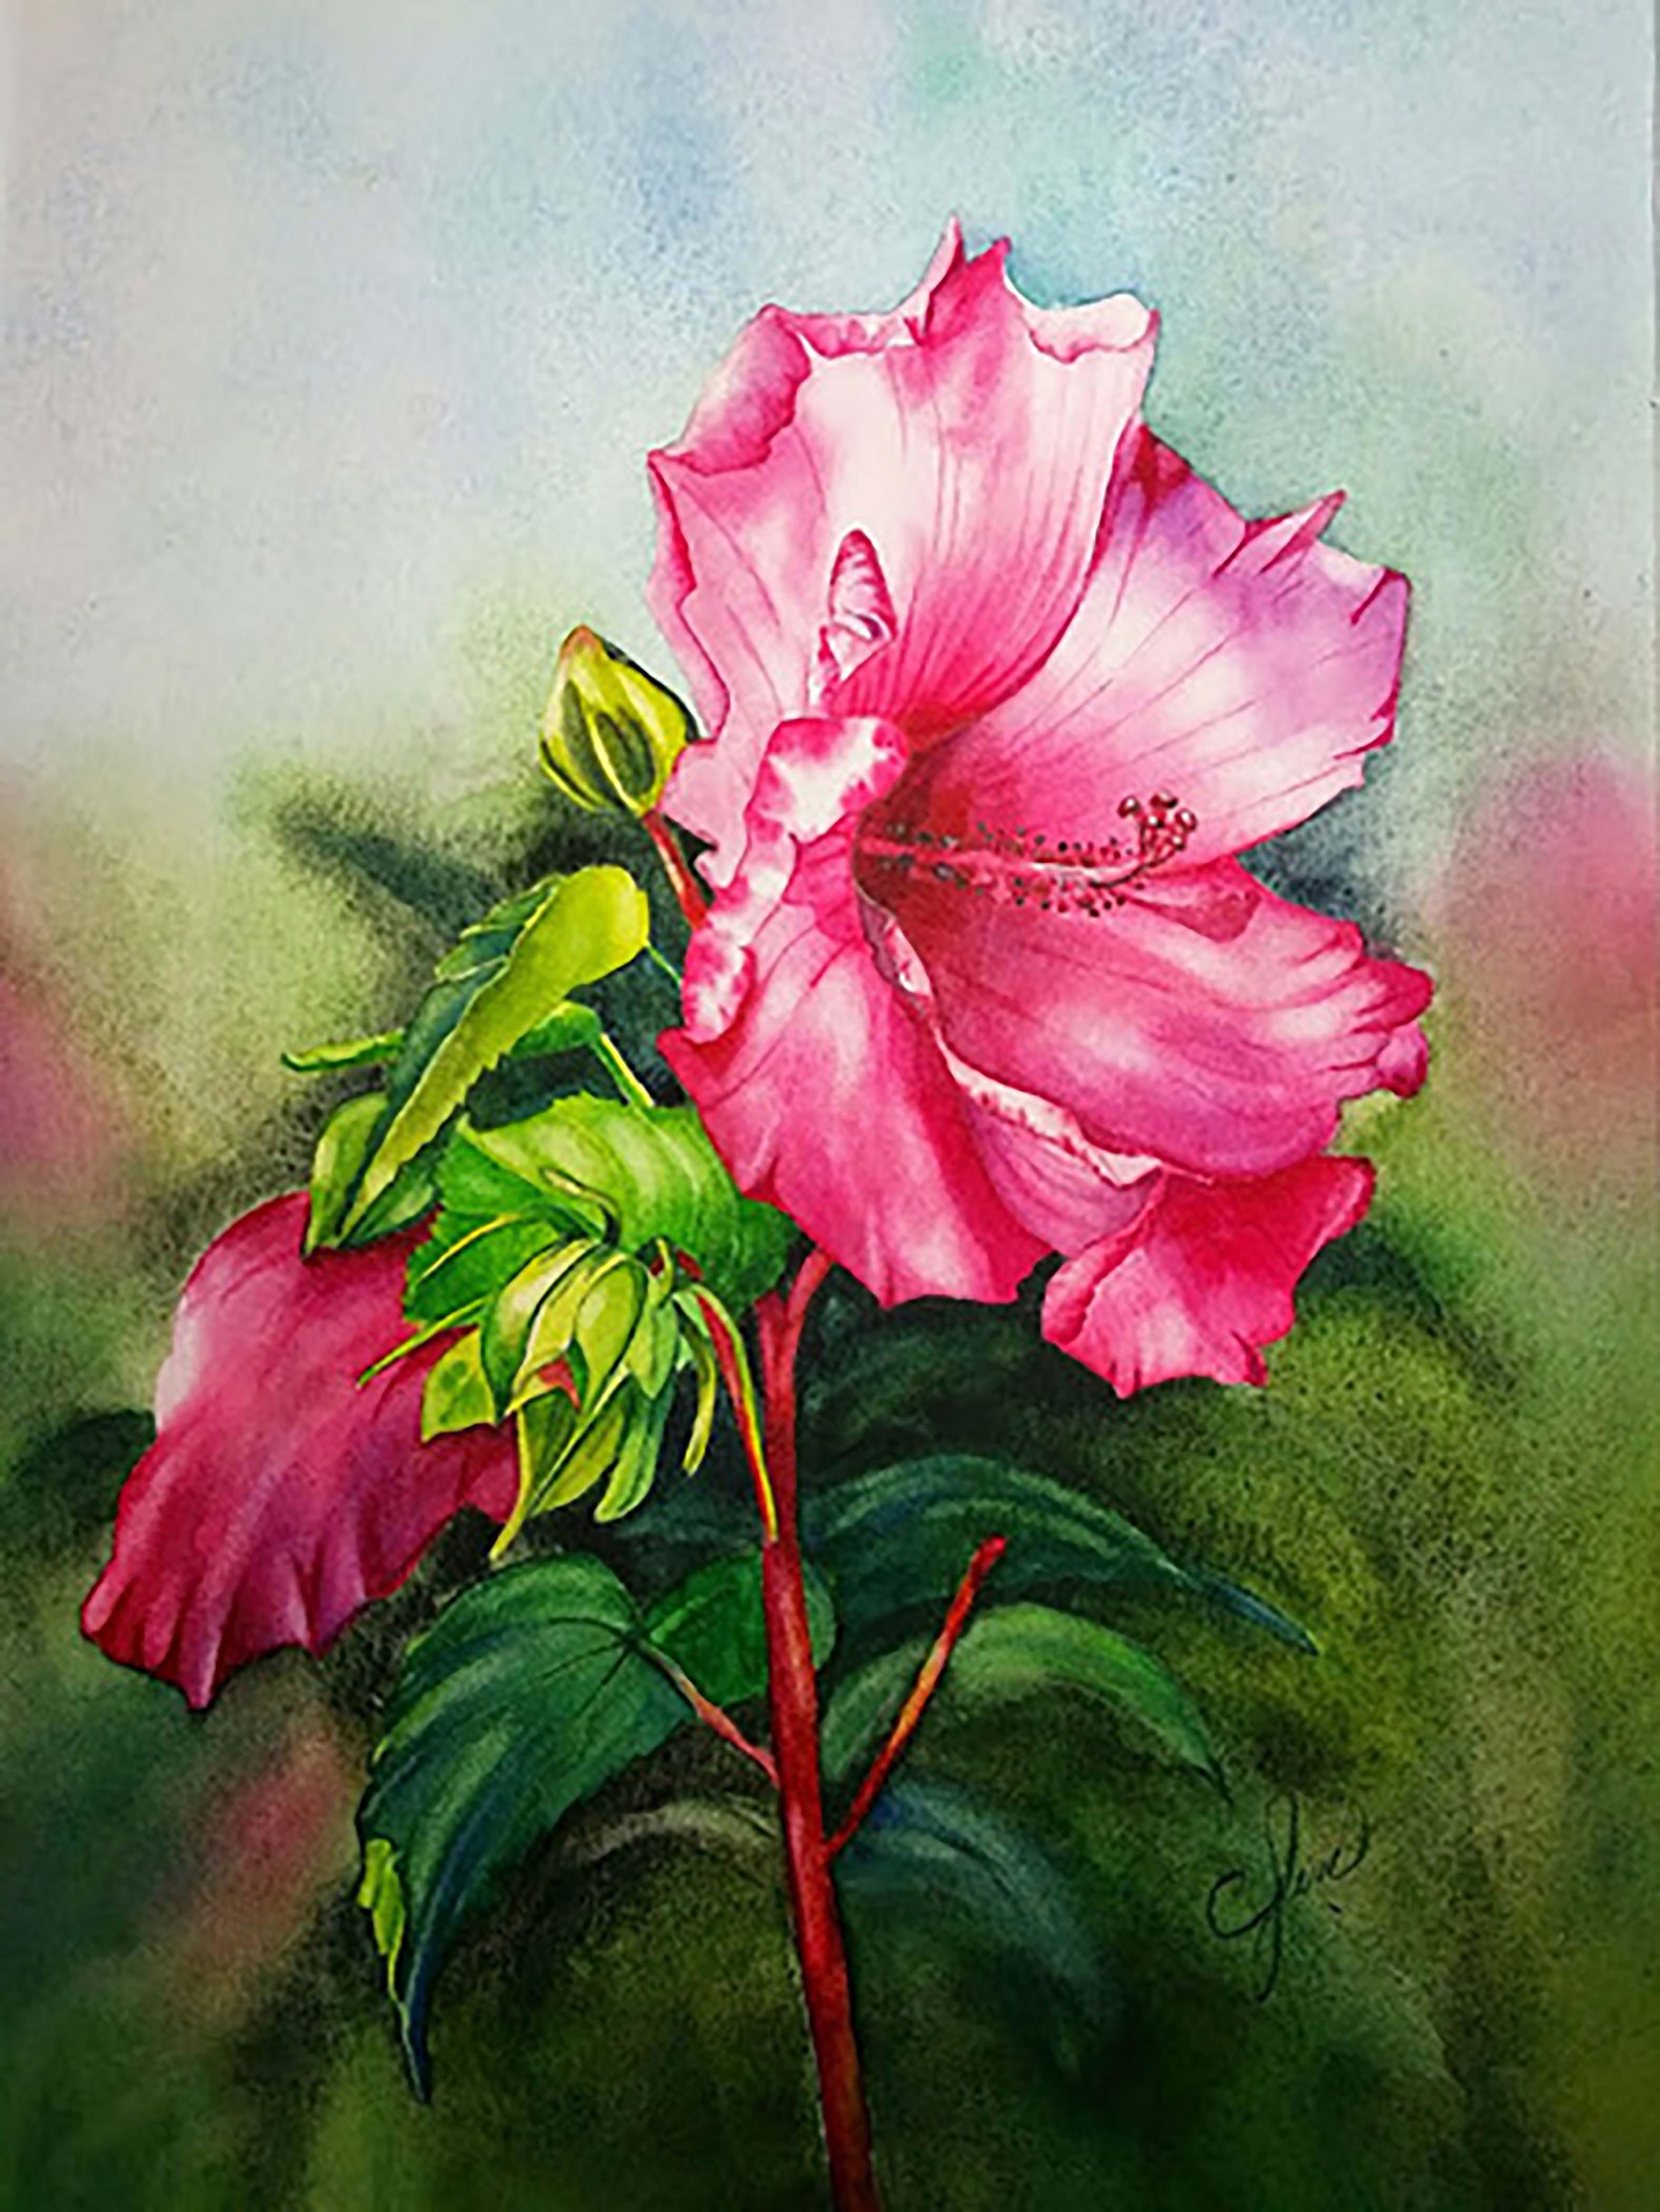 Watercolor / private tutoring